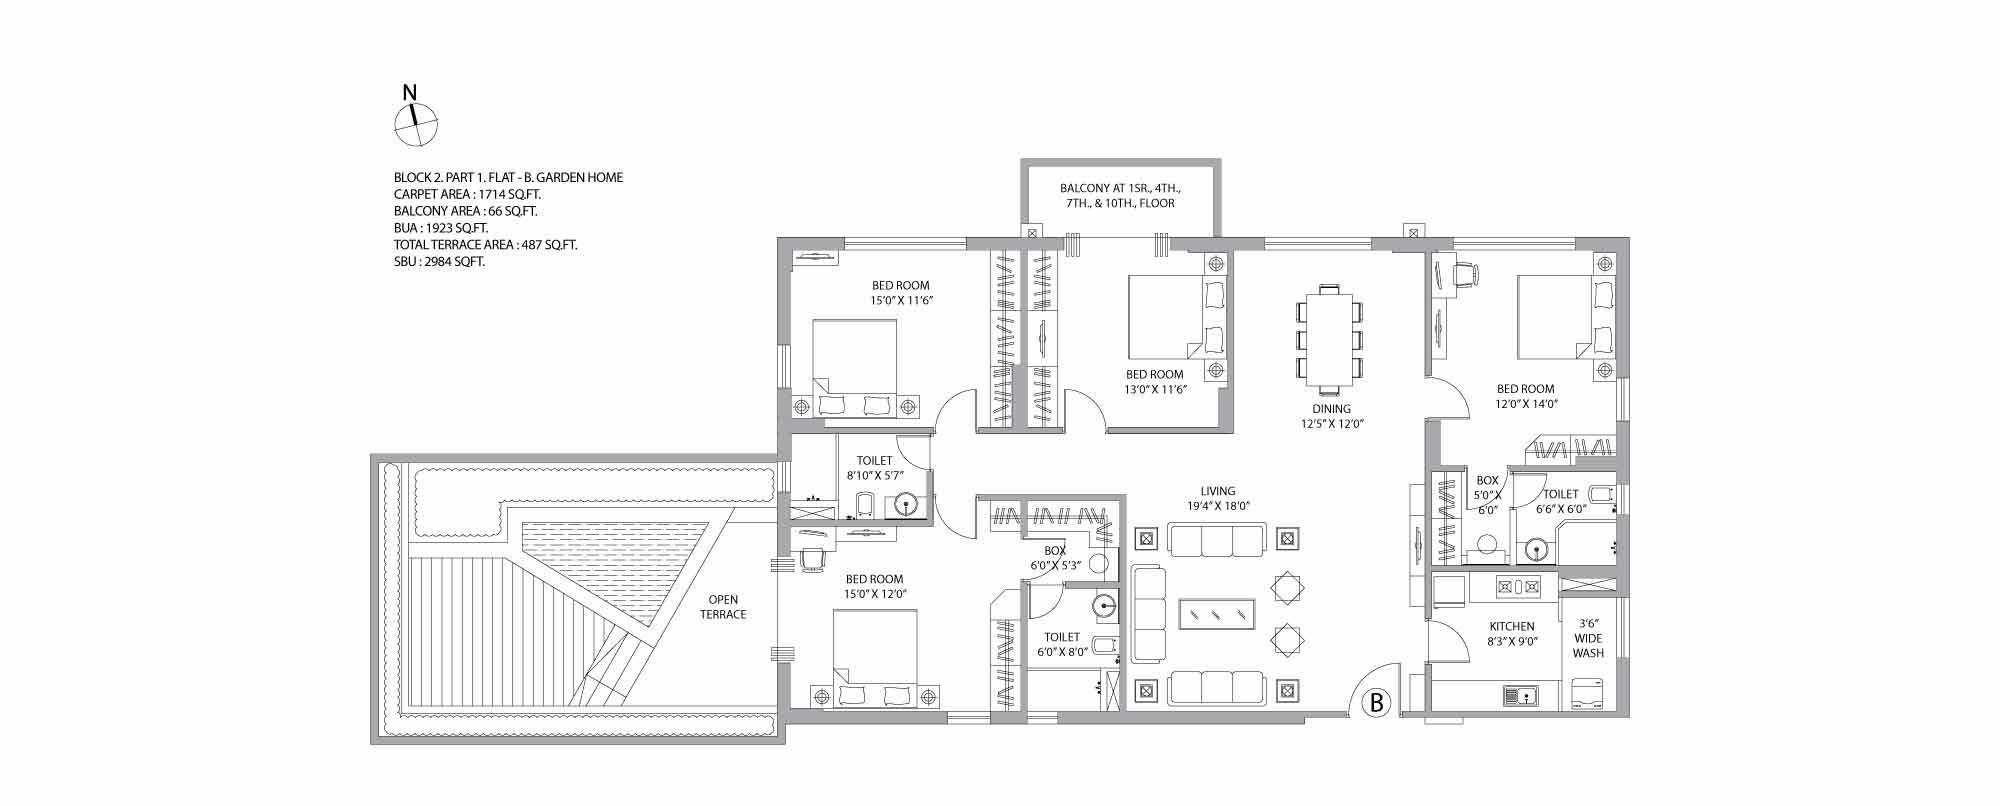 Site plan1